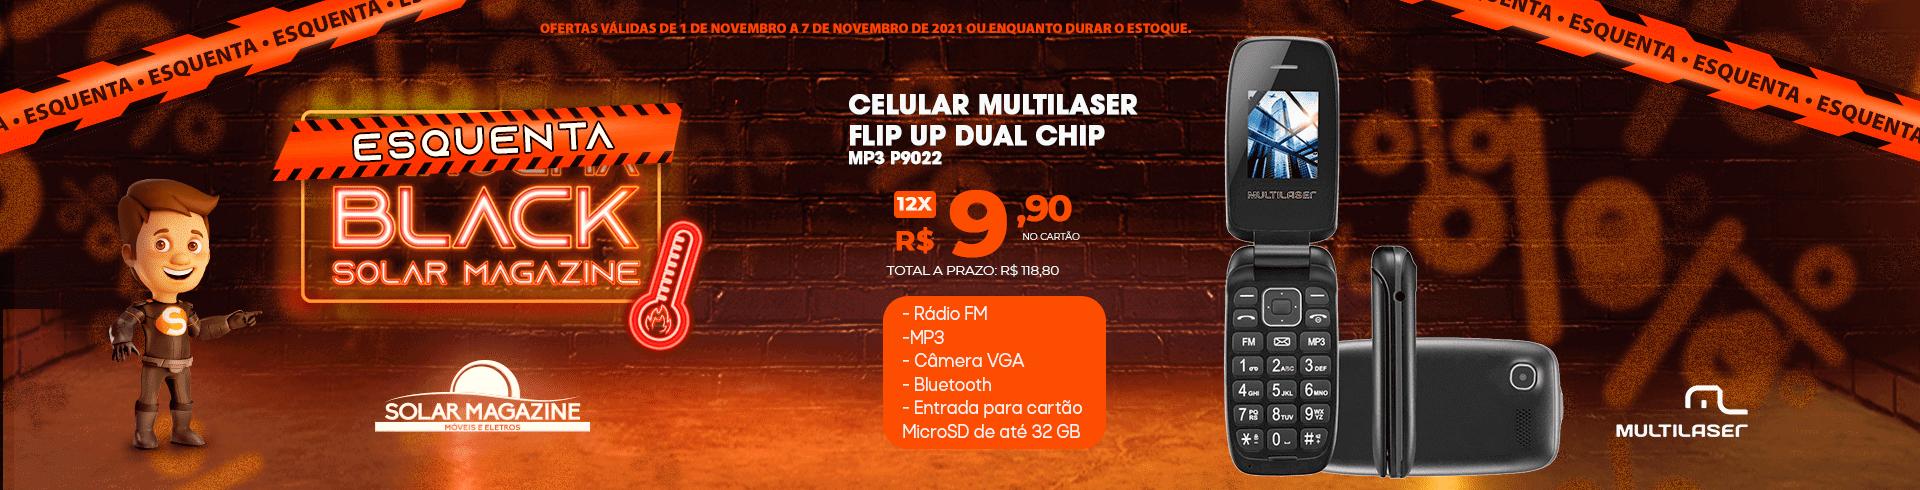 Celular Multilaser E 1-05 á 31-05-2021